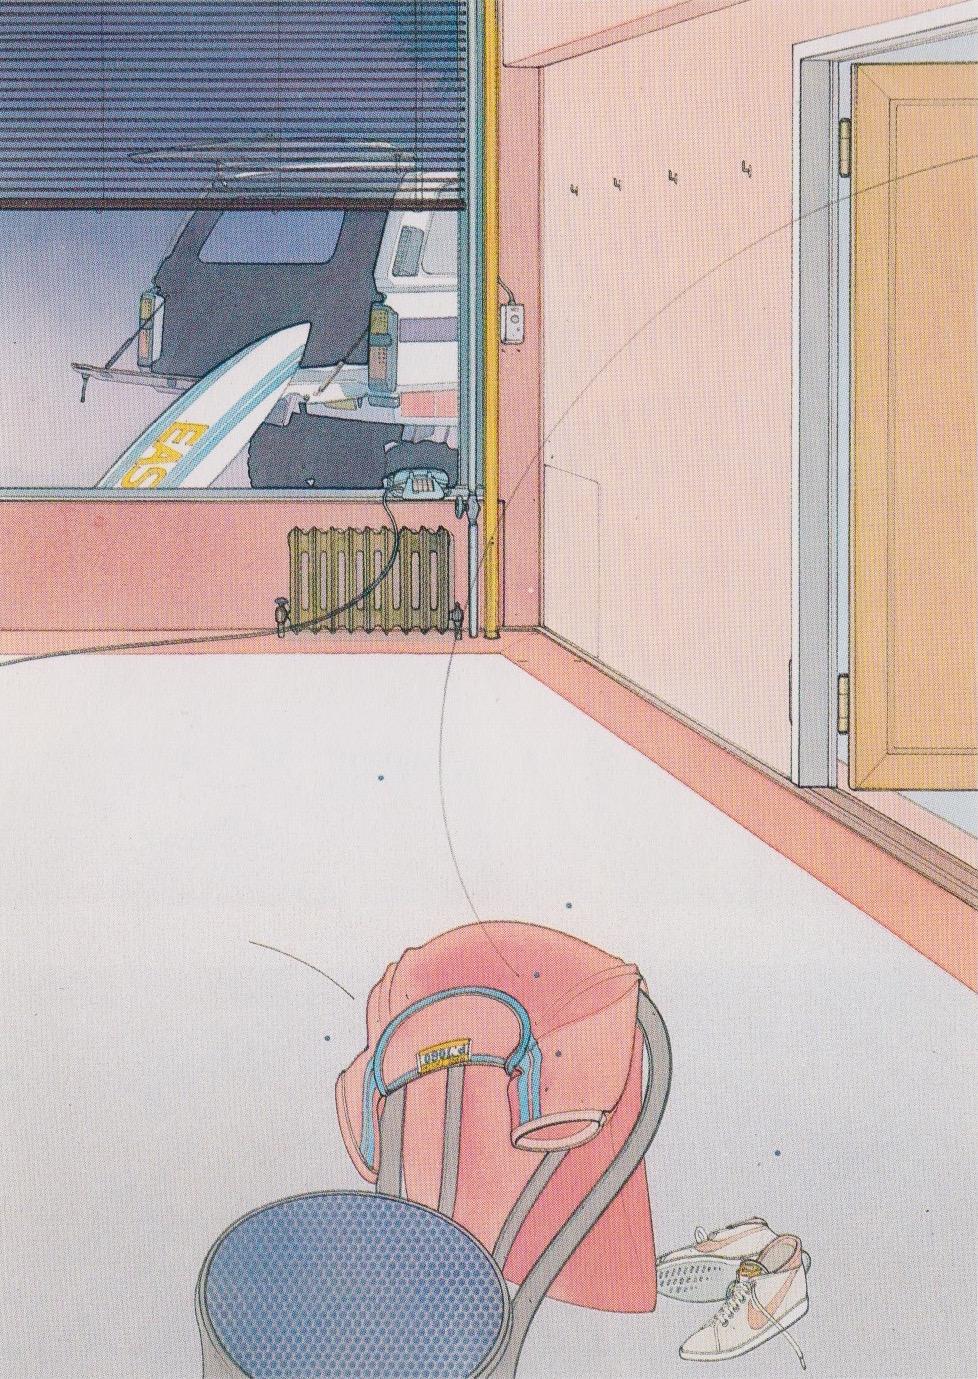 palmandlaser: Yukio Kitta (1985)